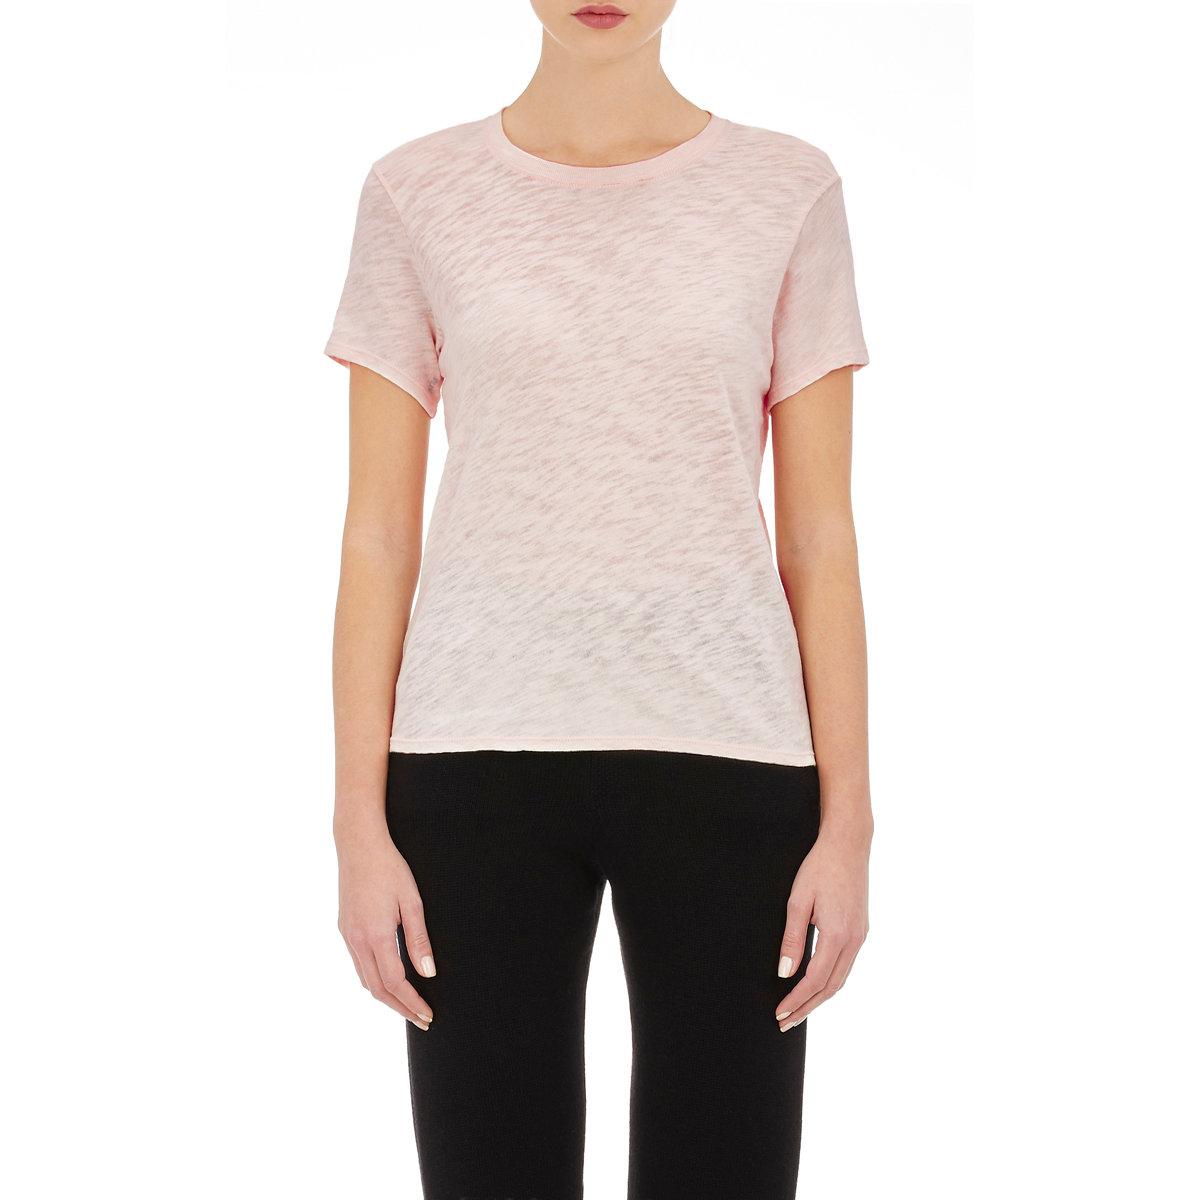 Atm women 39 s slub schoolboy t shirt in white lyst for Atm t shirt sale